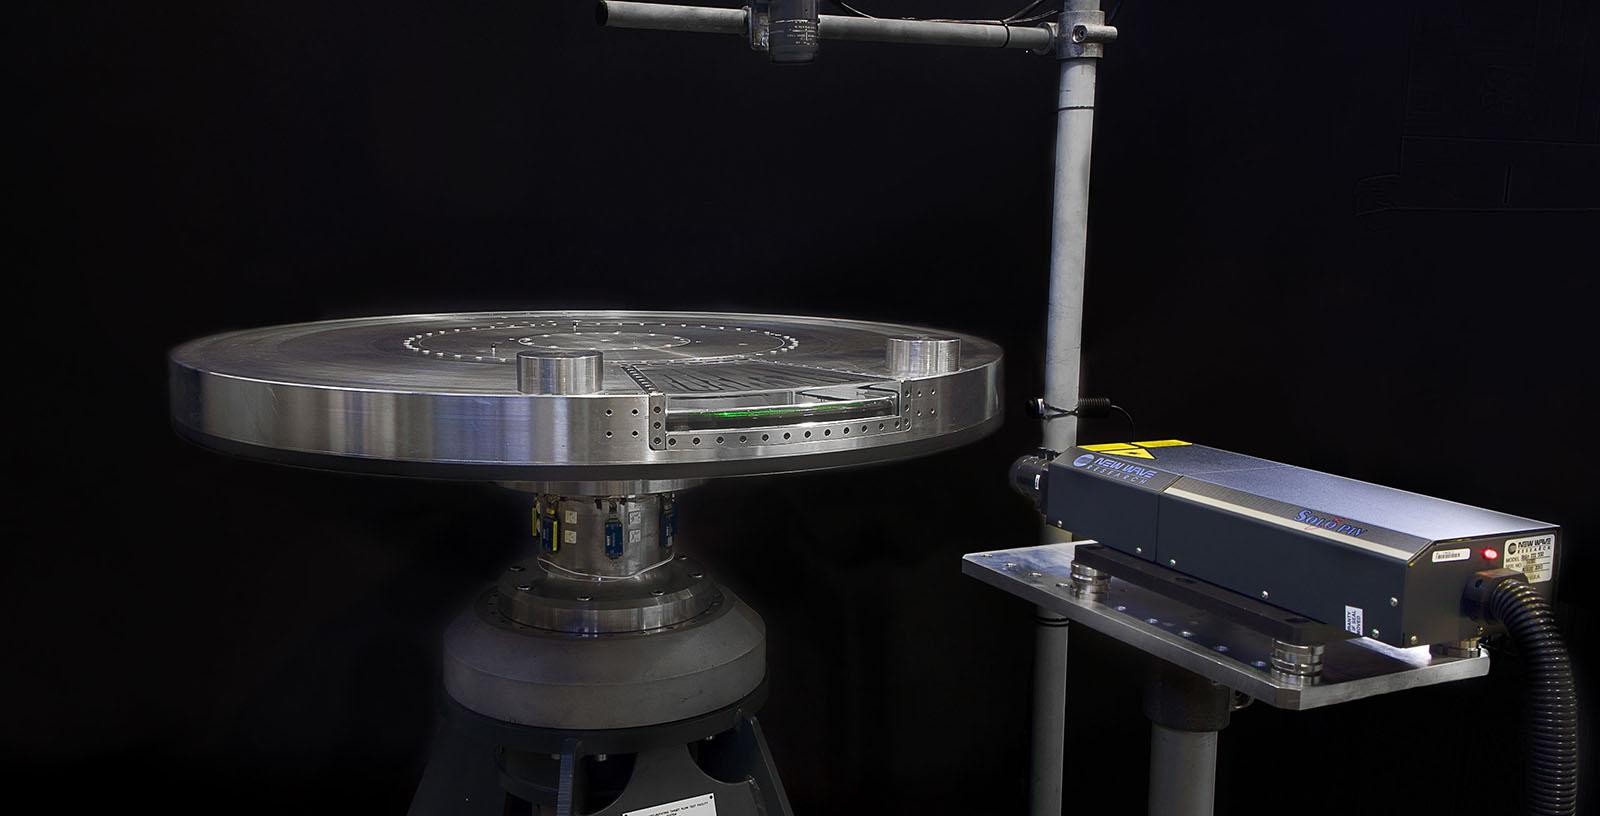 Rotating_Target_Flow_Test_Particle_Velocimetry_Bilbao_Idom_ADA__2_